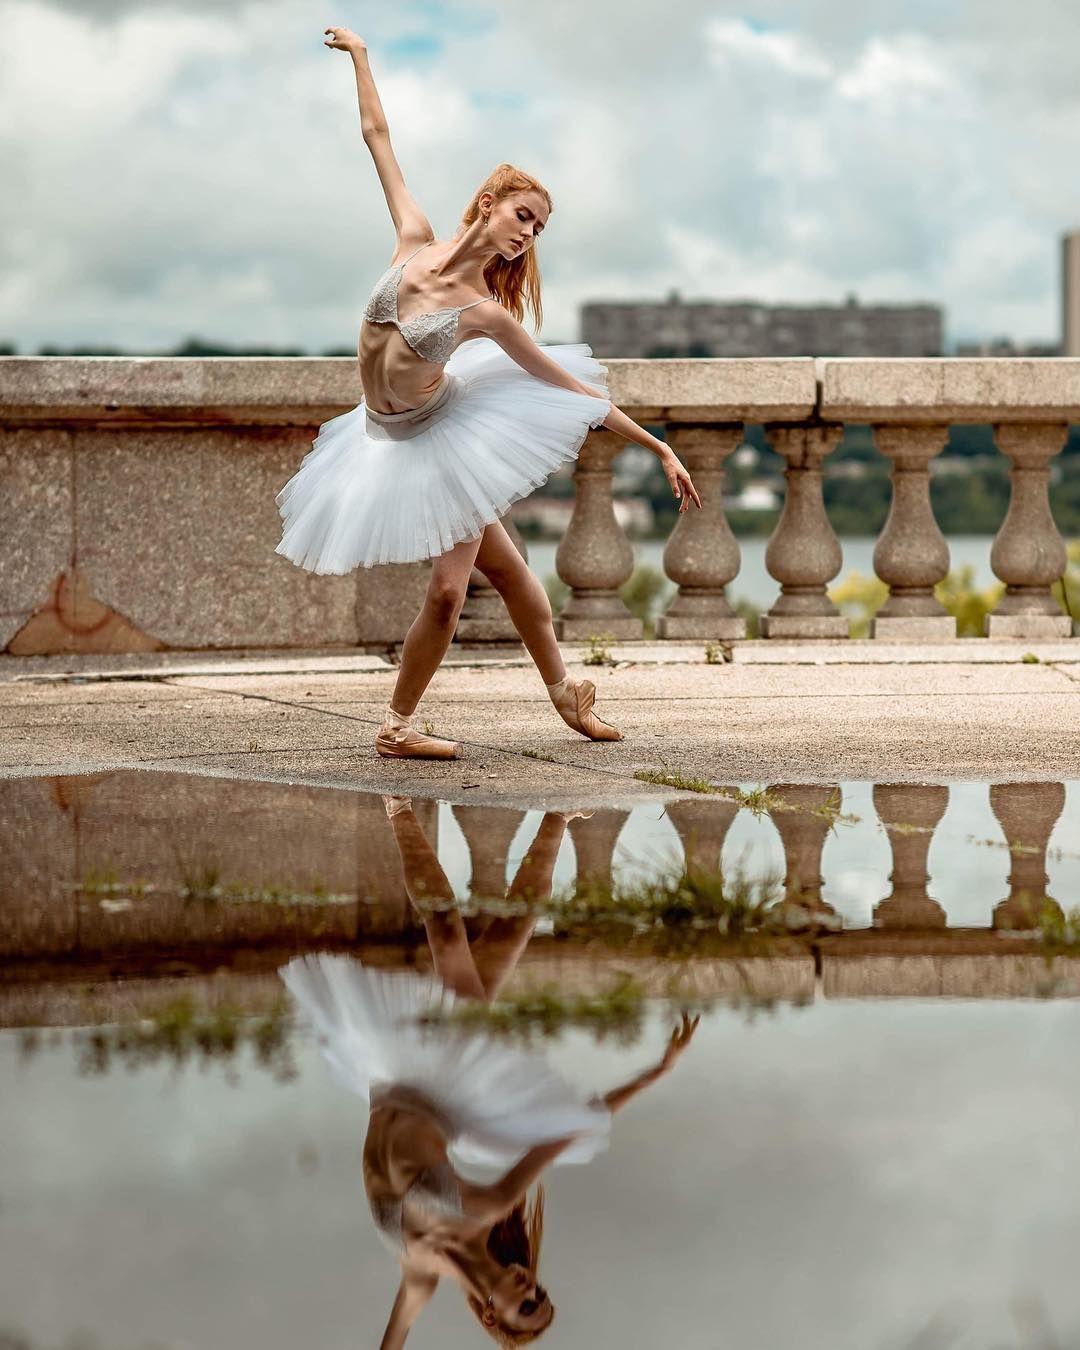 кронштадта спутника балерина фотосессия идеи пляжа построена